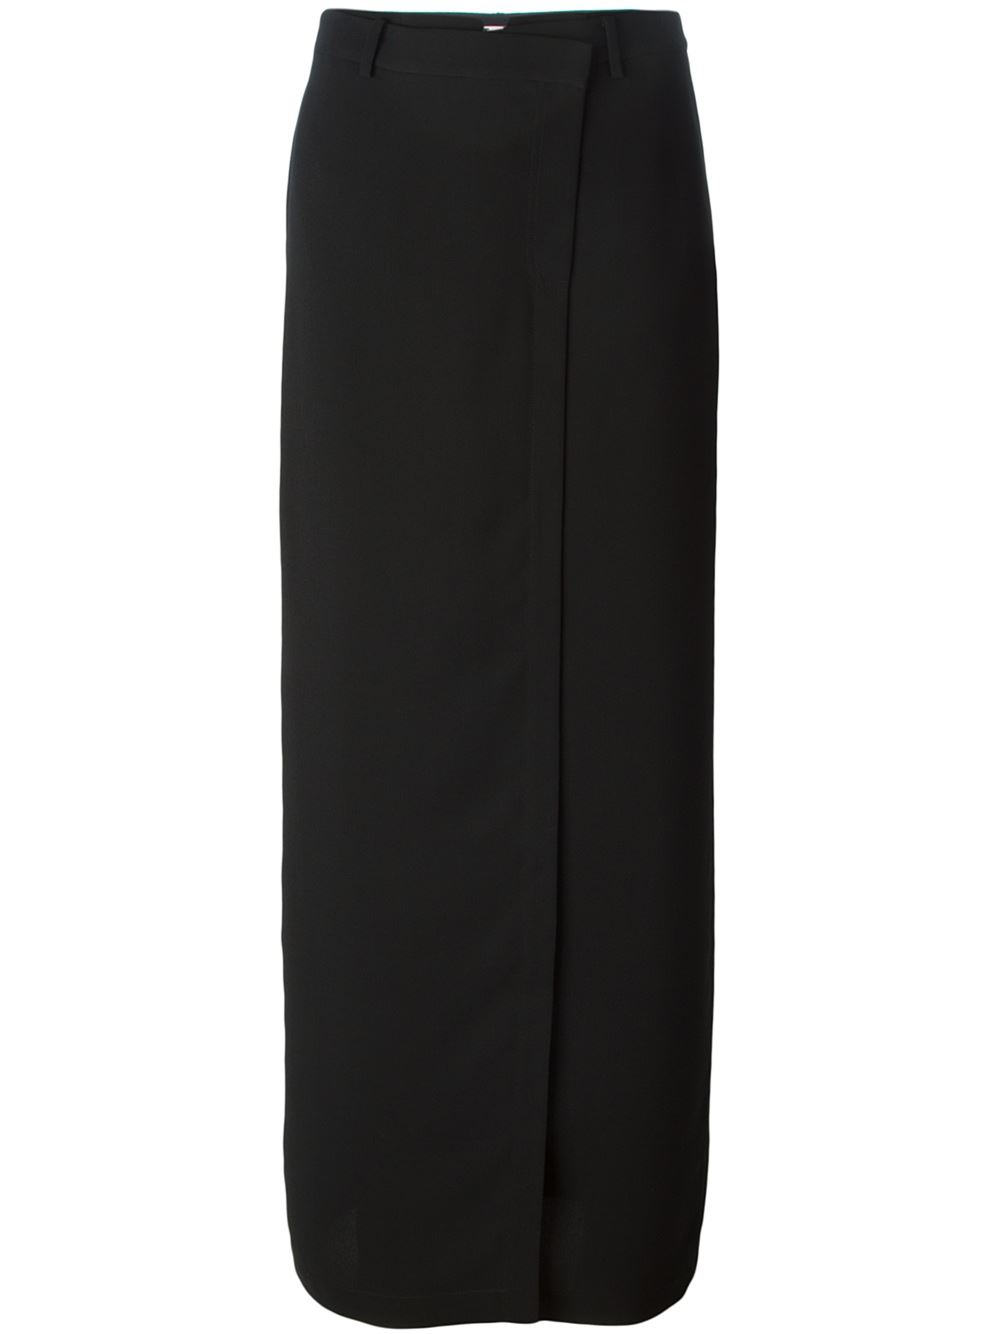 wang high waisted maxi skirt in black lyst